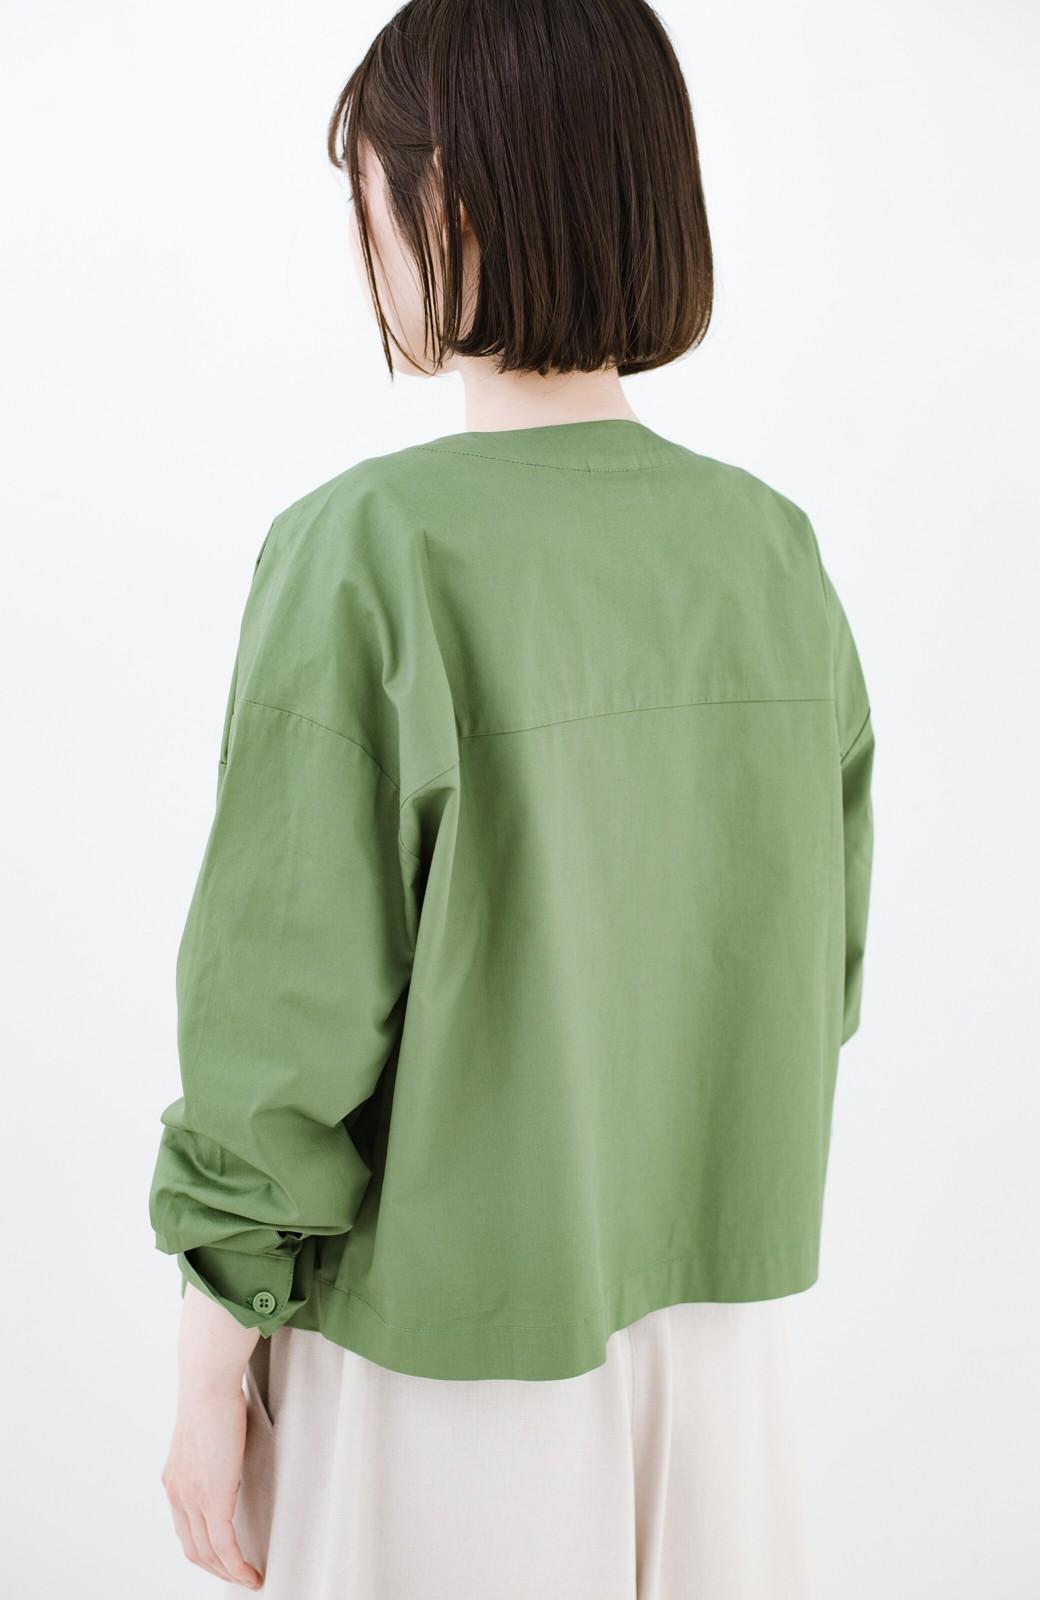 haco! さっと羽織ればコーデに味付け 軽さが自慢のノーカラーミリタリージャケット <カーキ>の商品写真13